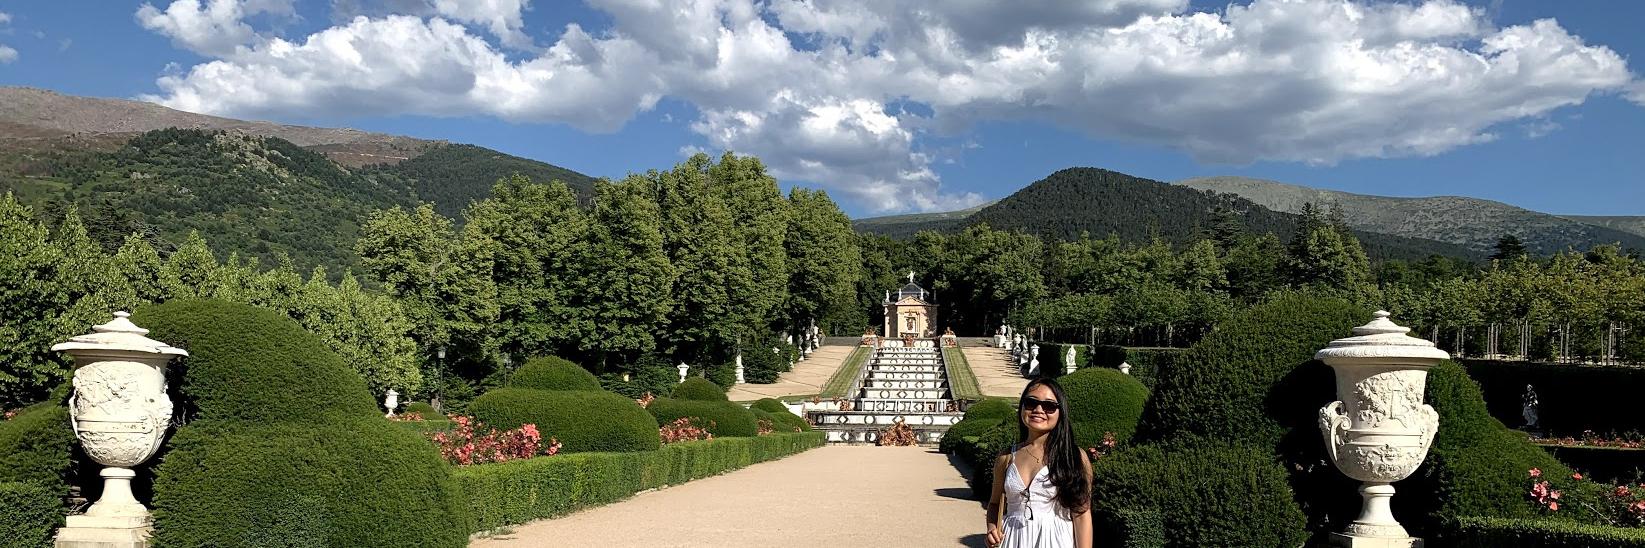 https://gody.vn/blog/phuonganhpham.dht2525/post/palacio-real-de-la-granja-segovia-7293